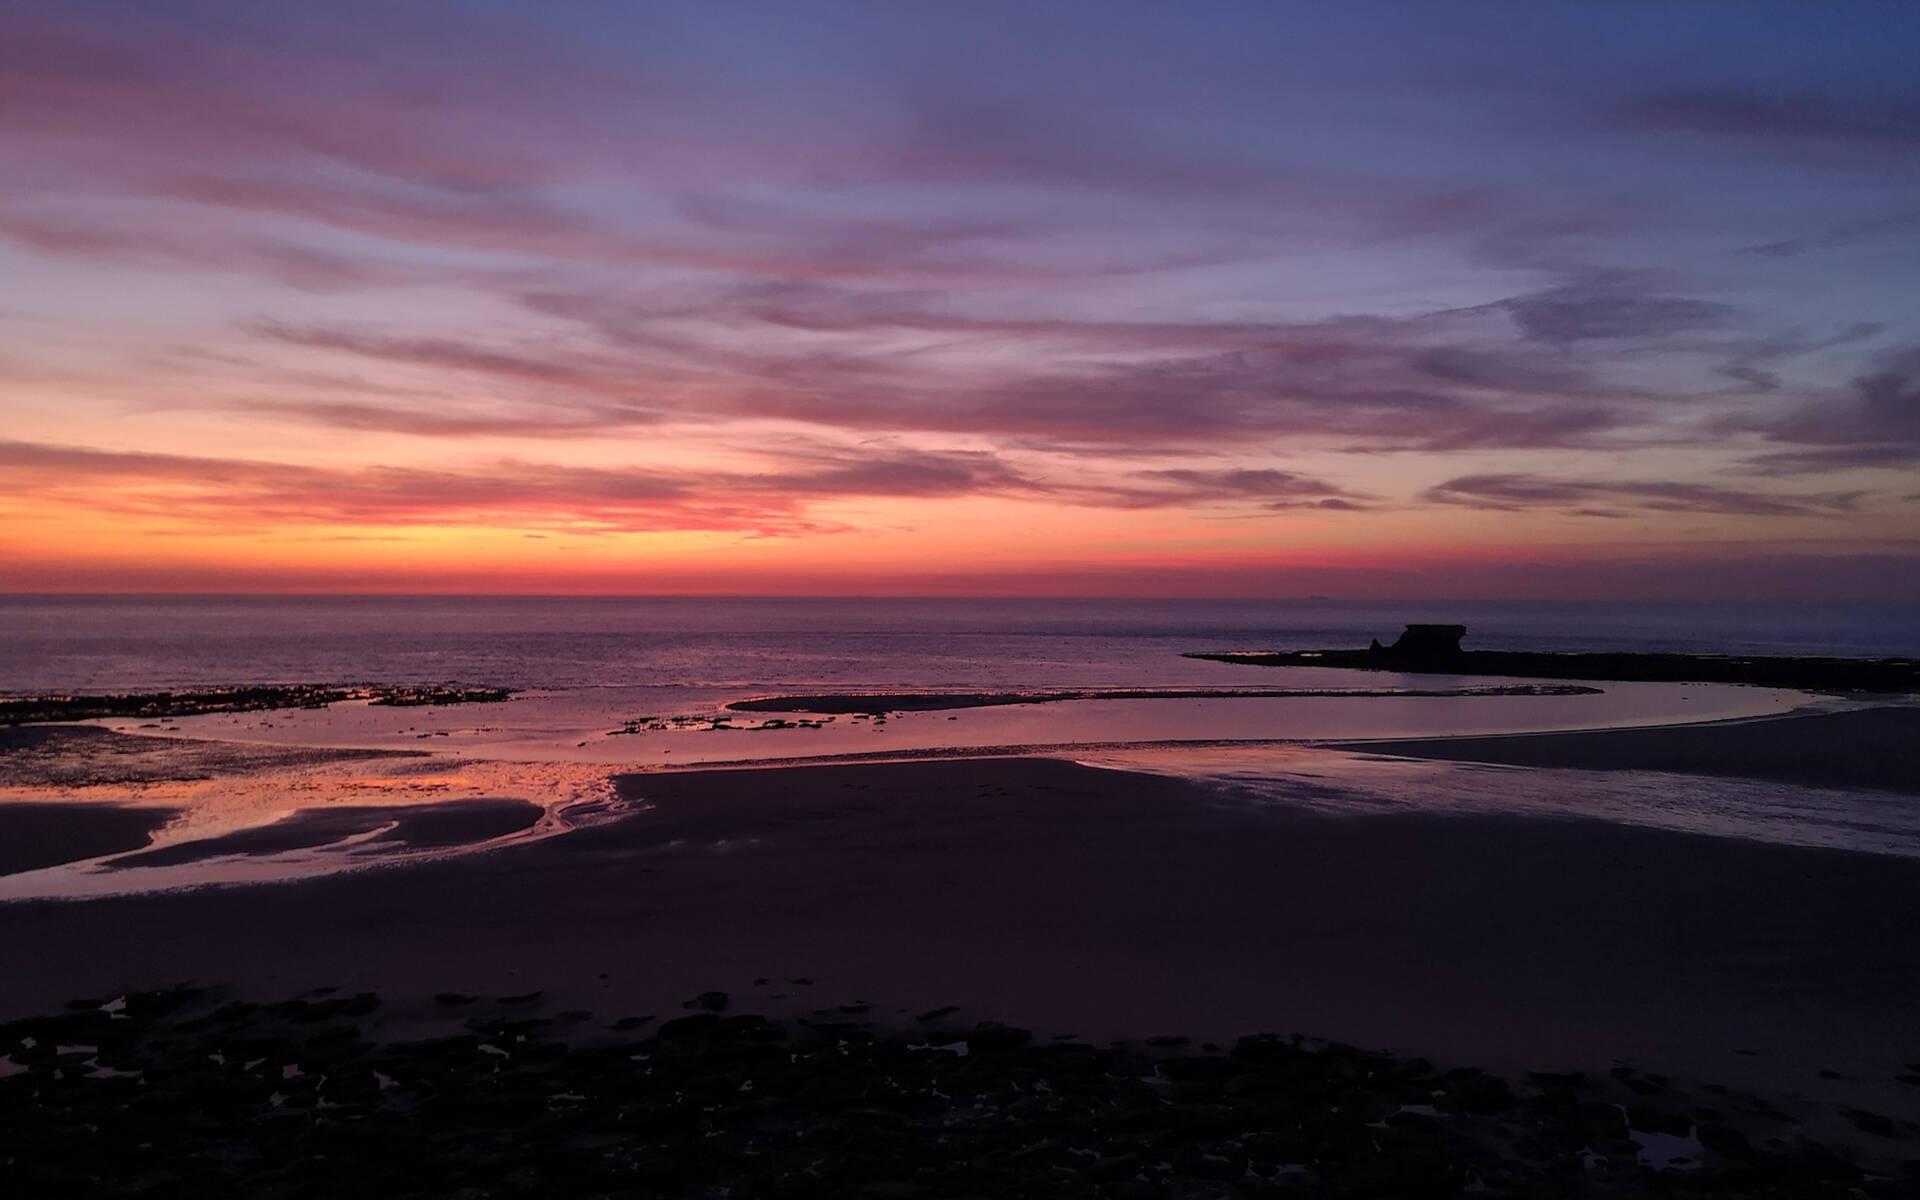 coucher de soleil ©A. Gourdin